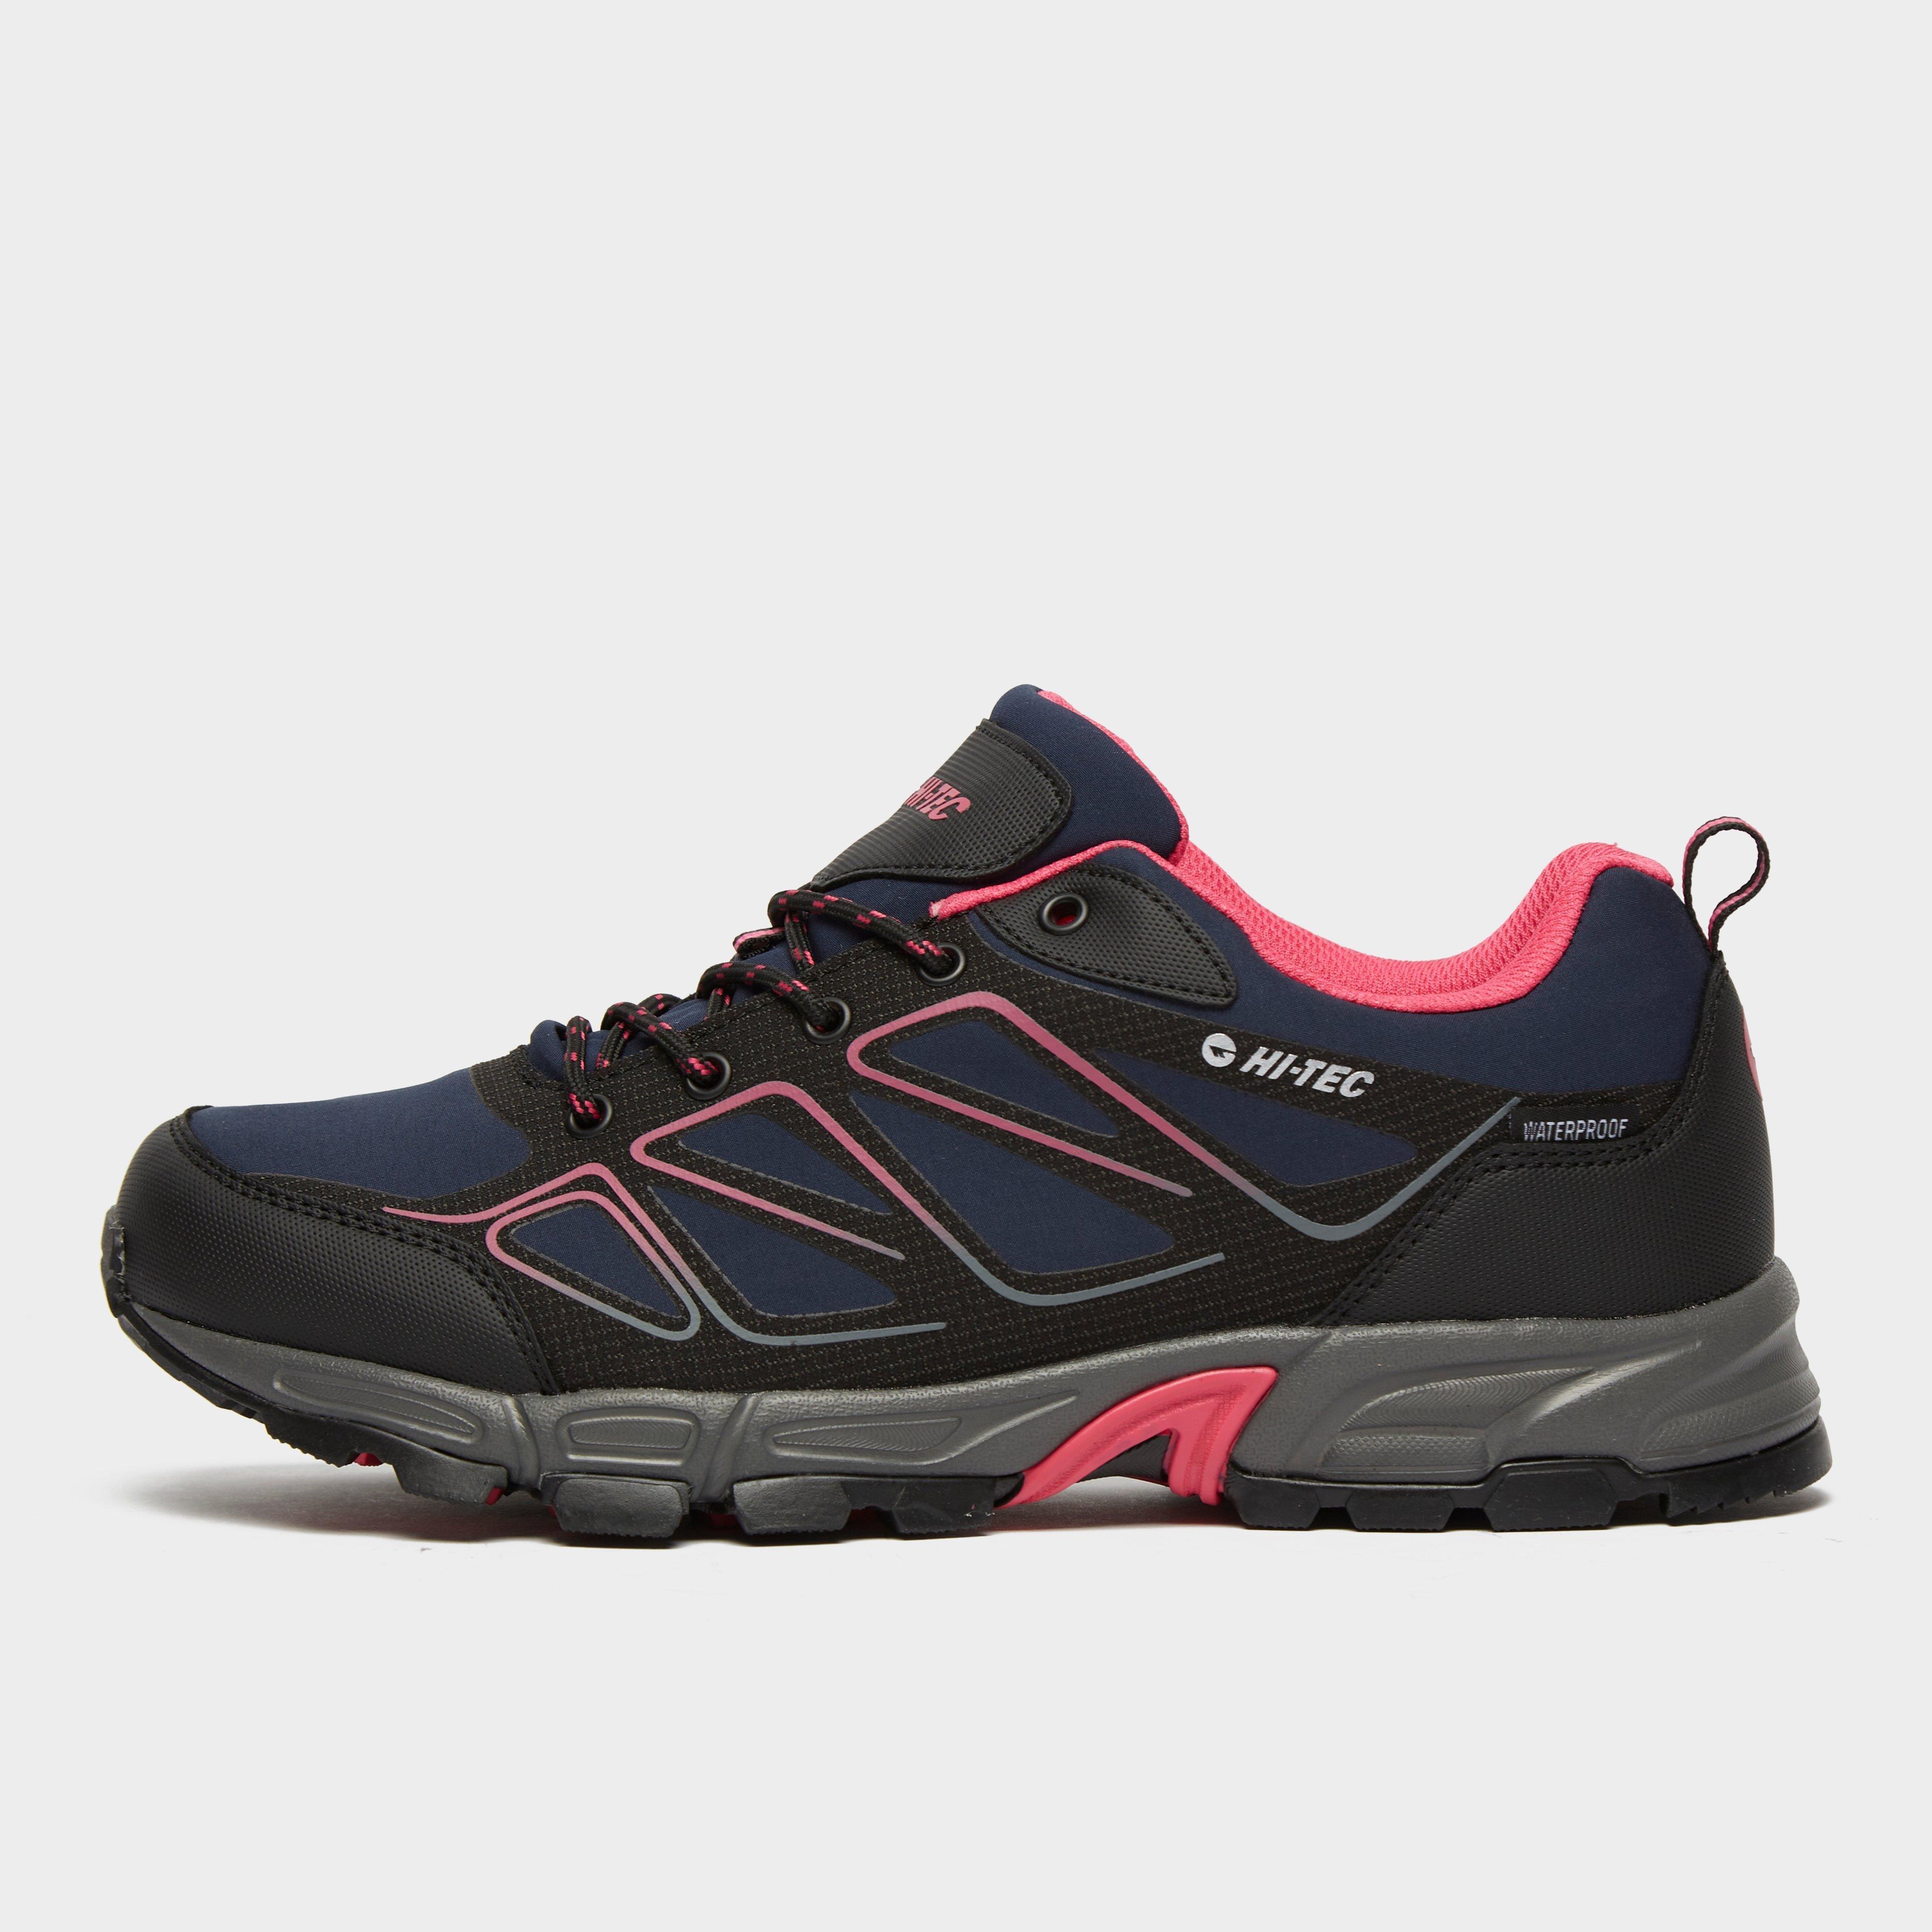 Hi Tec Womens Typhoon Waterproof Shoes - Navy/nvy  Navy/nvy